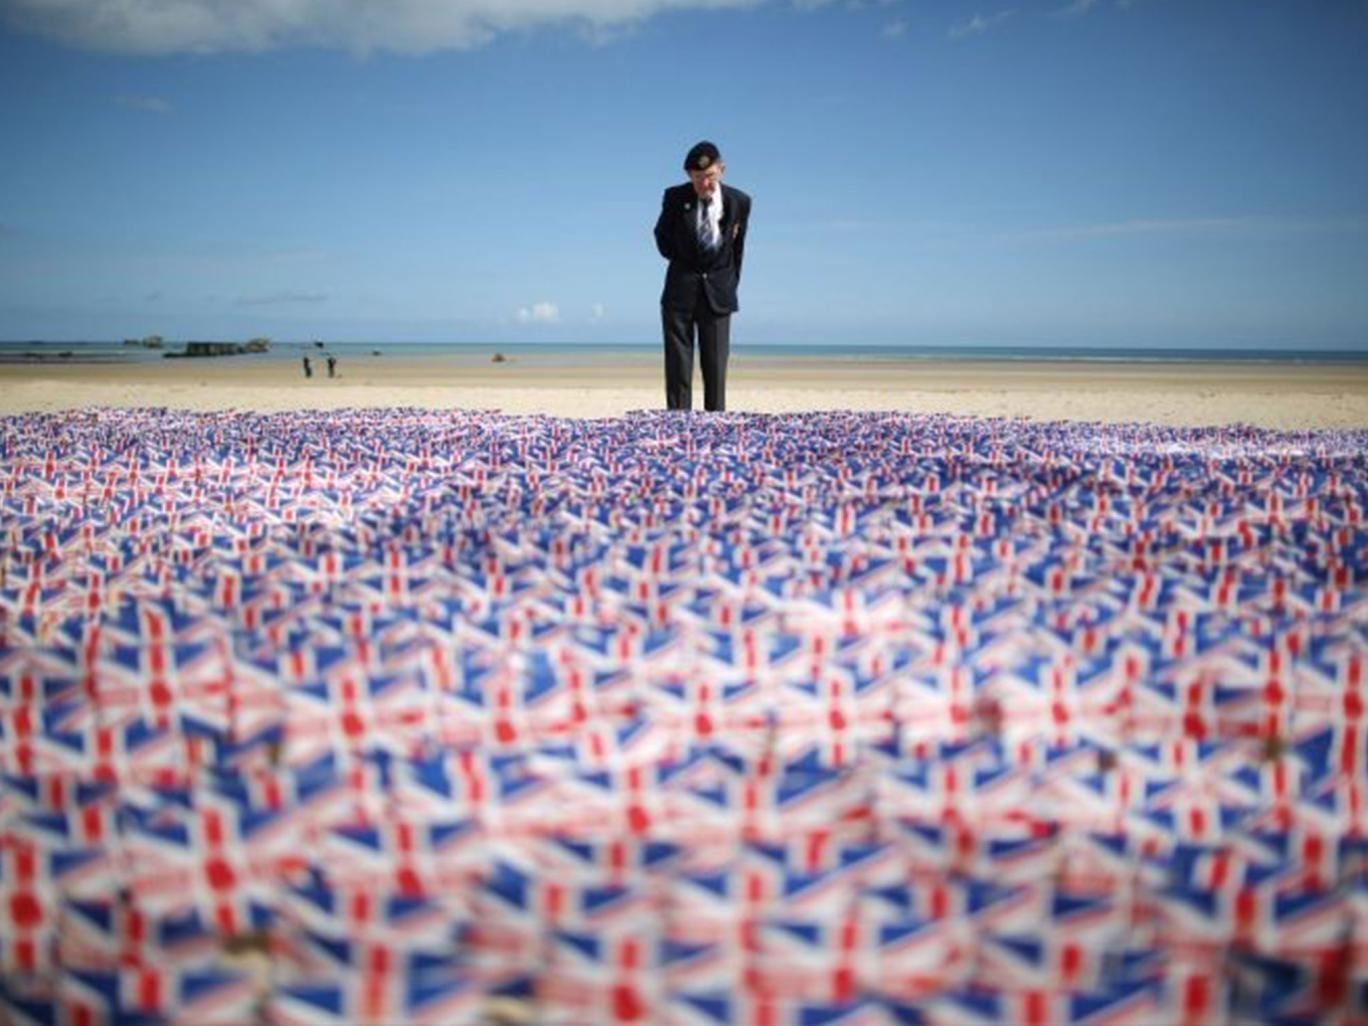 WW2 veteran Fred Holborn, from the Fleet Air Arm, on Gold beach